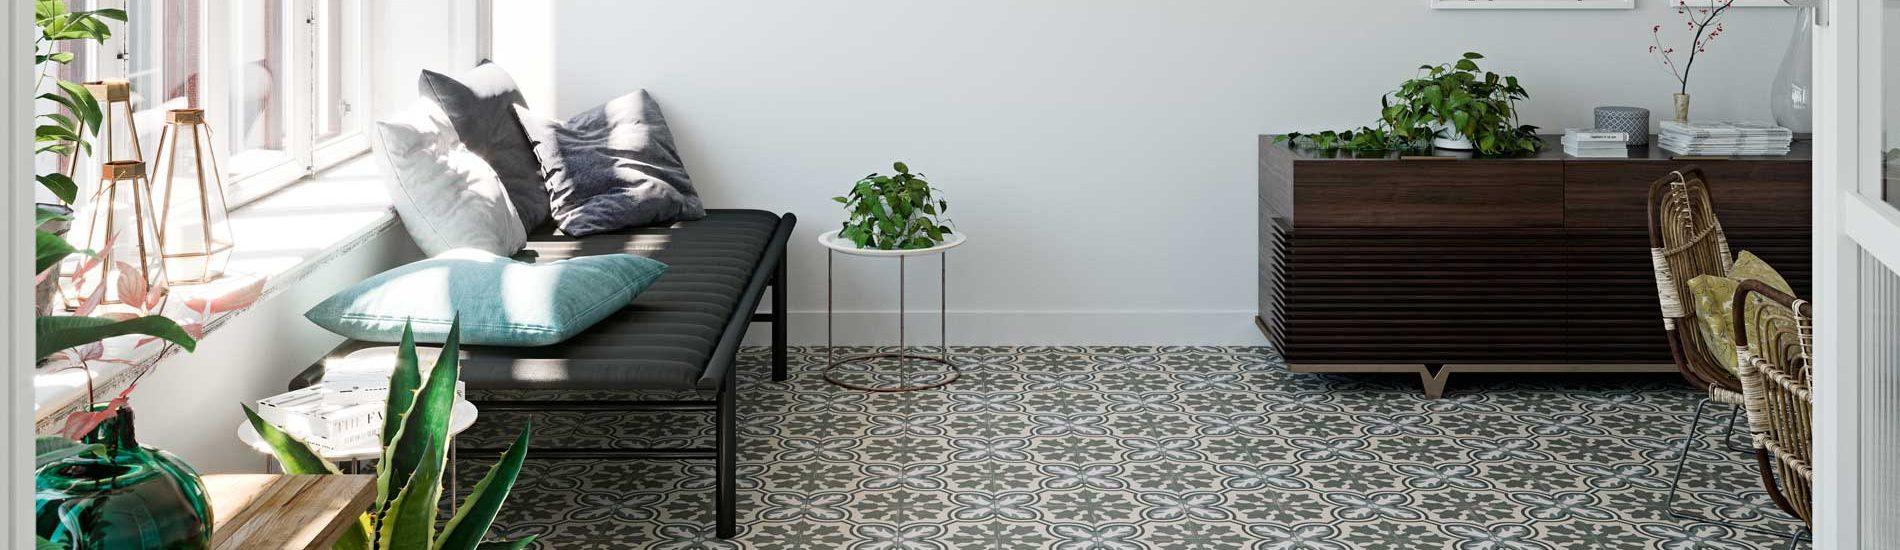 banner-tango-cement-deco-look-tile-spanish-aparici-apavisa